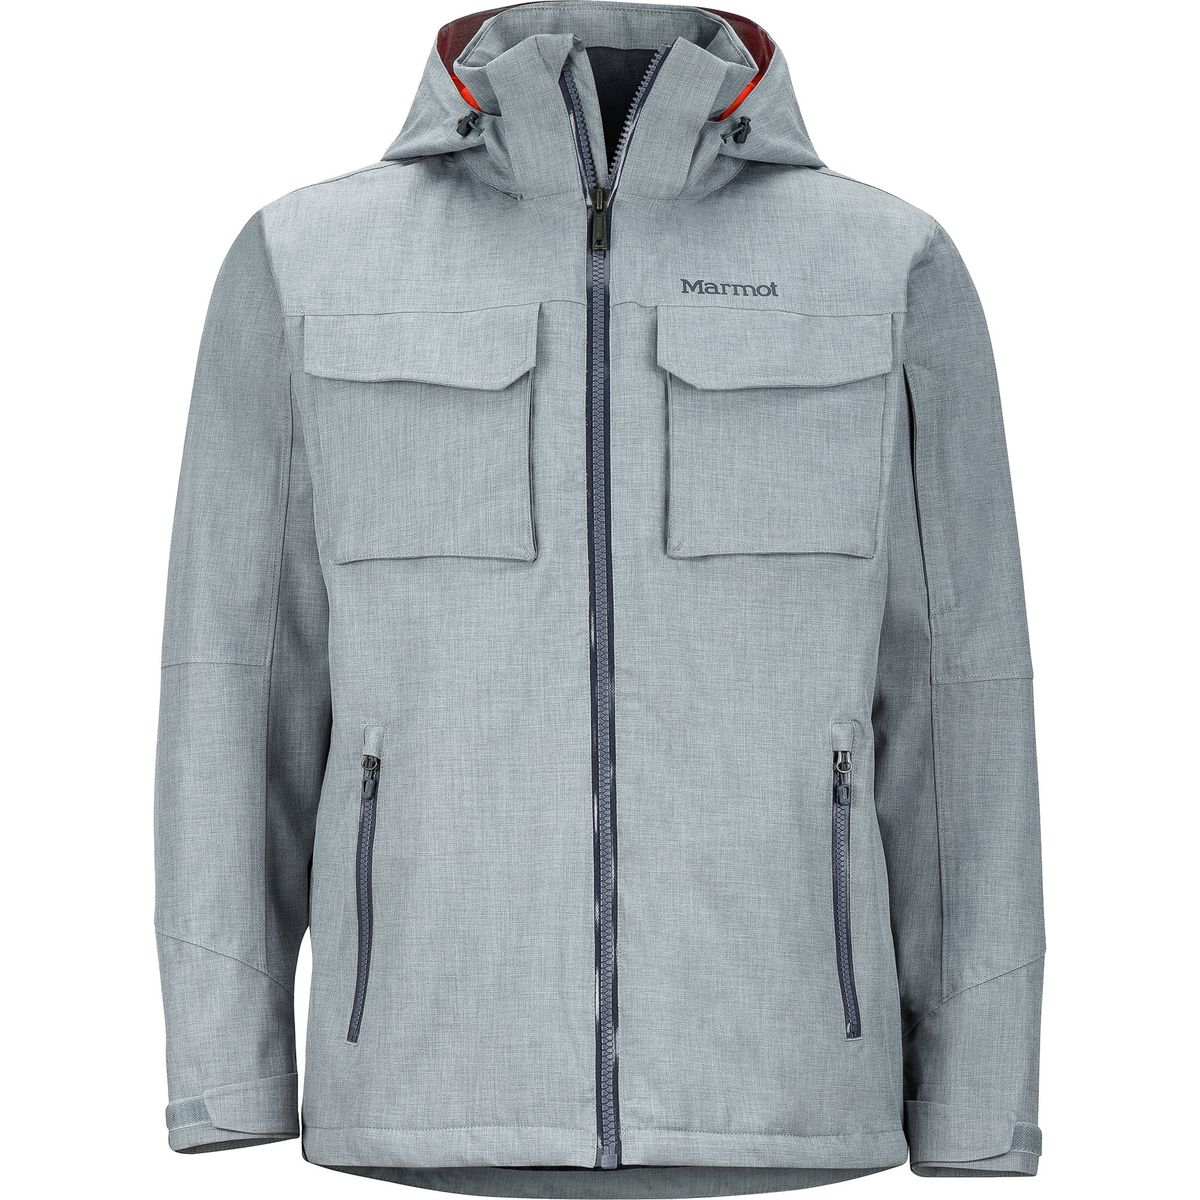 Marmot Whitecliff Jacket - Men